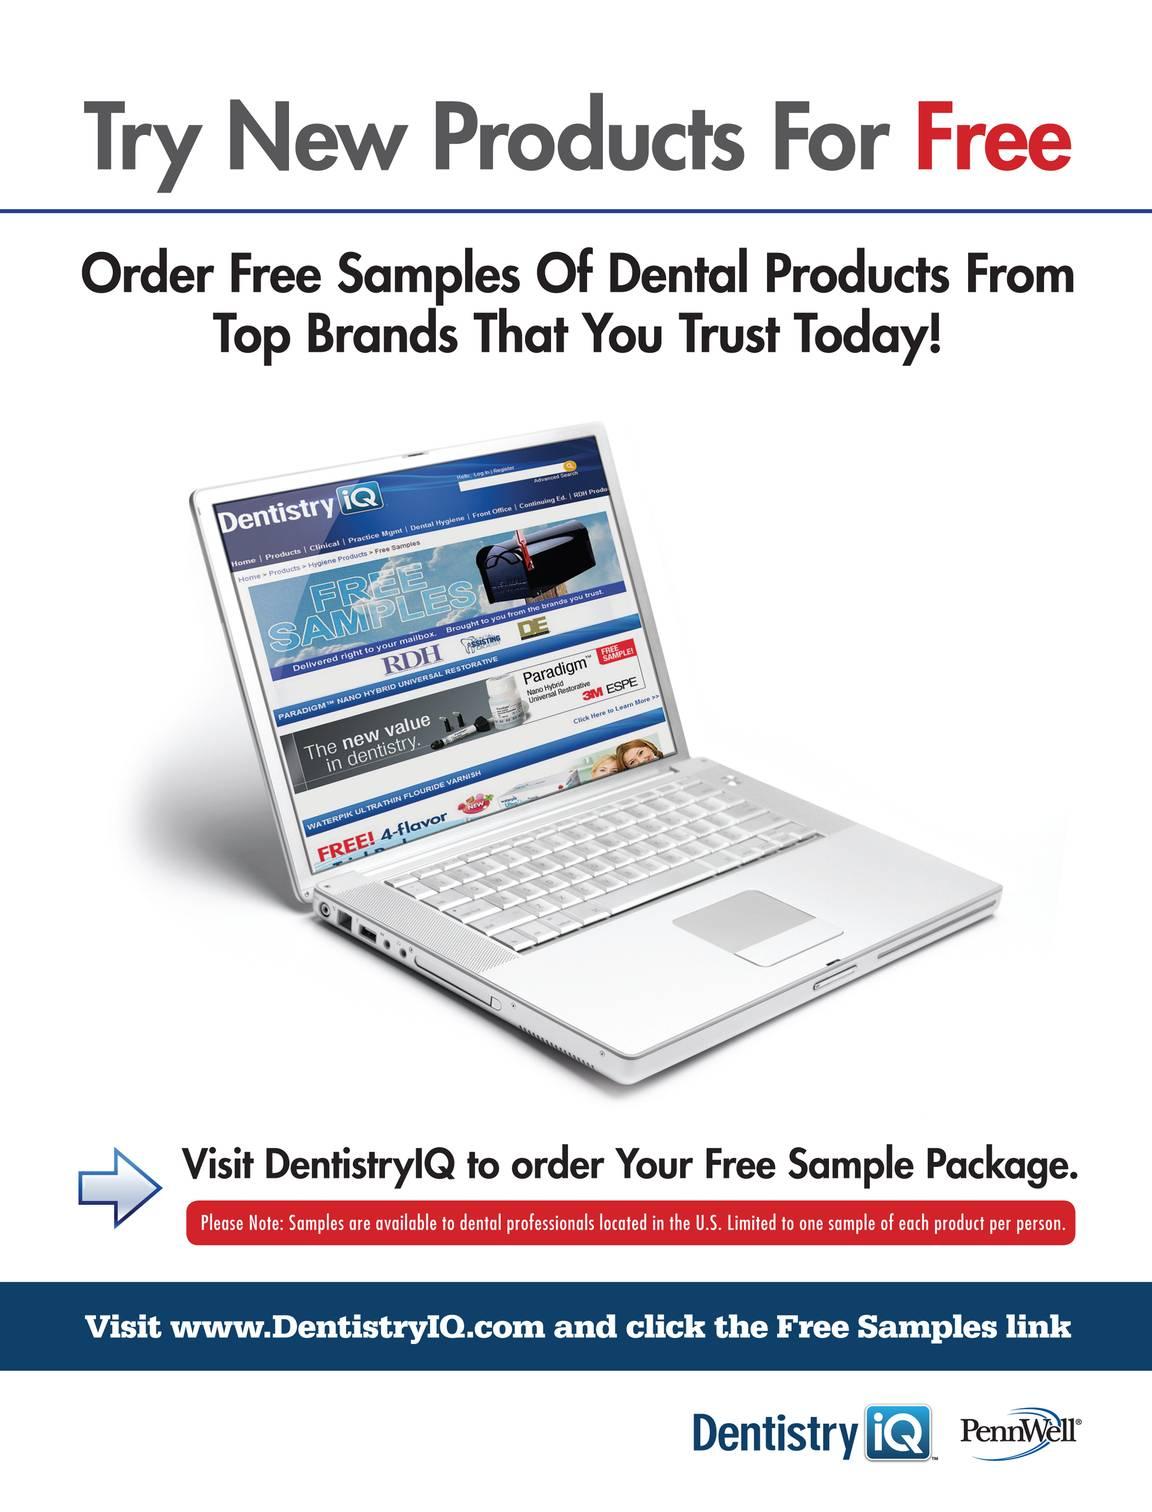 Dental Economics - February 2015 - page 92